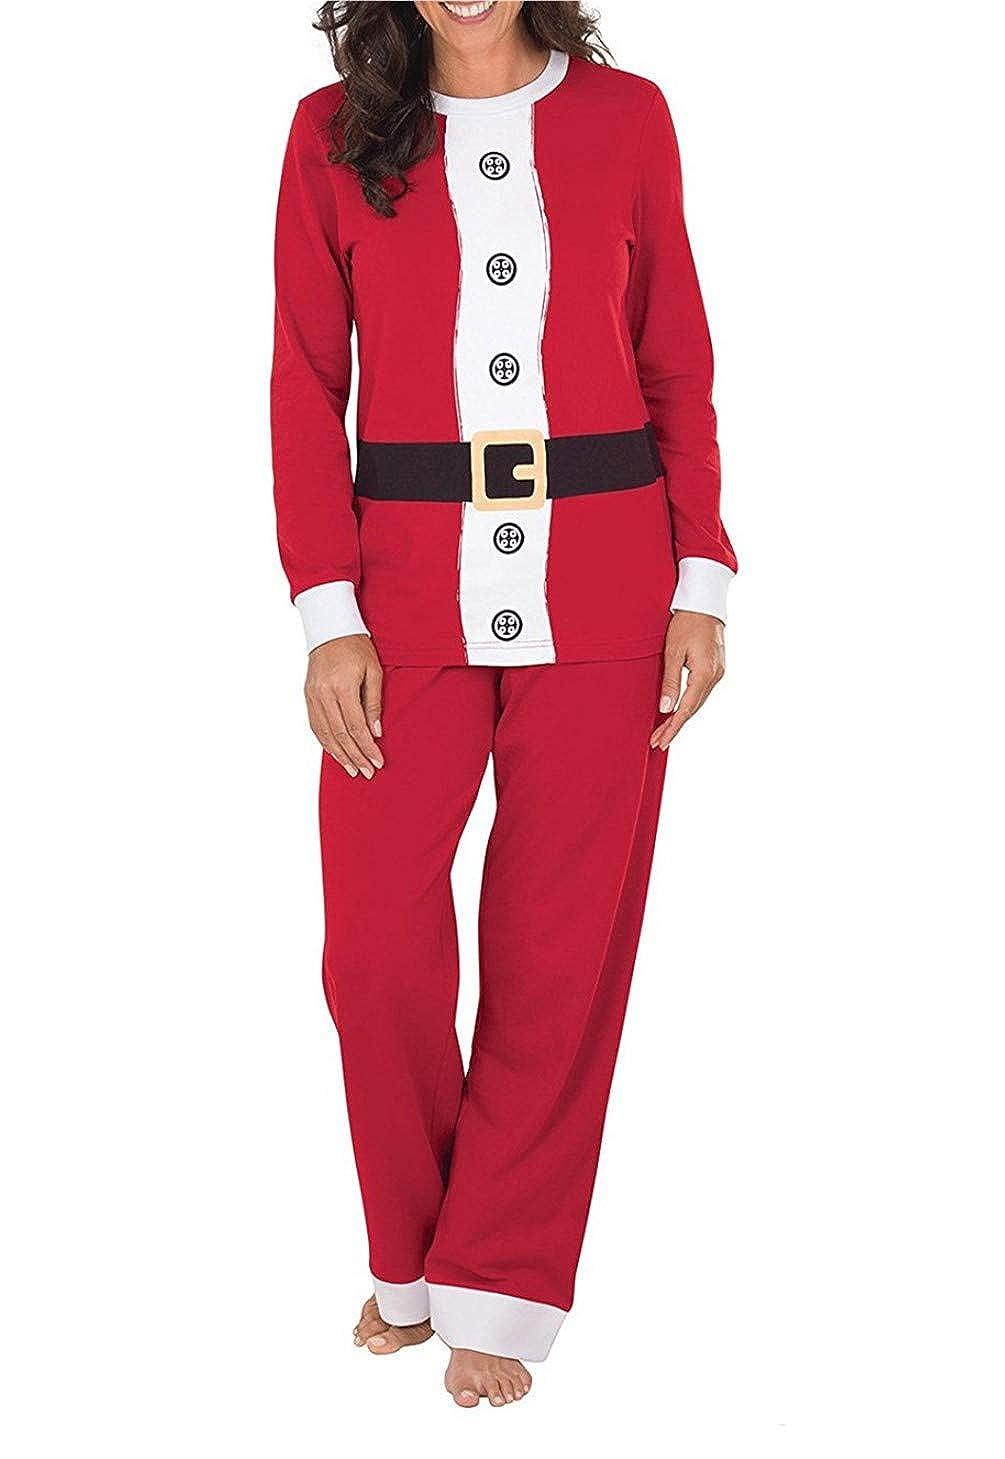 Q&Y Matching Christmas Pajamas for Family Sleepwear Nightwear Red Pajamas Set